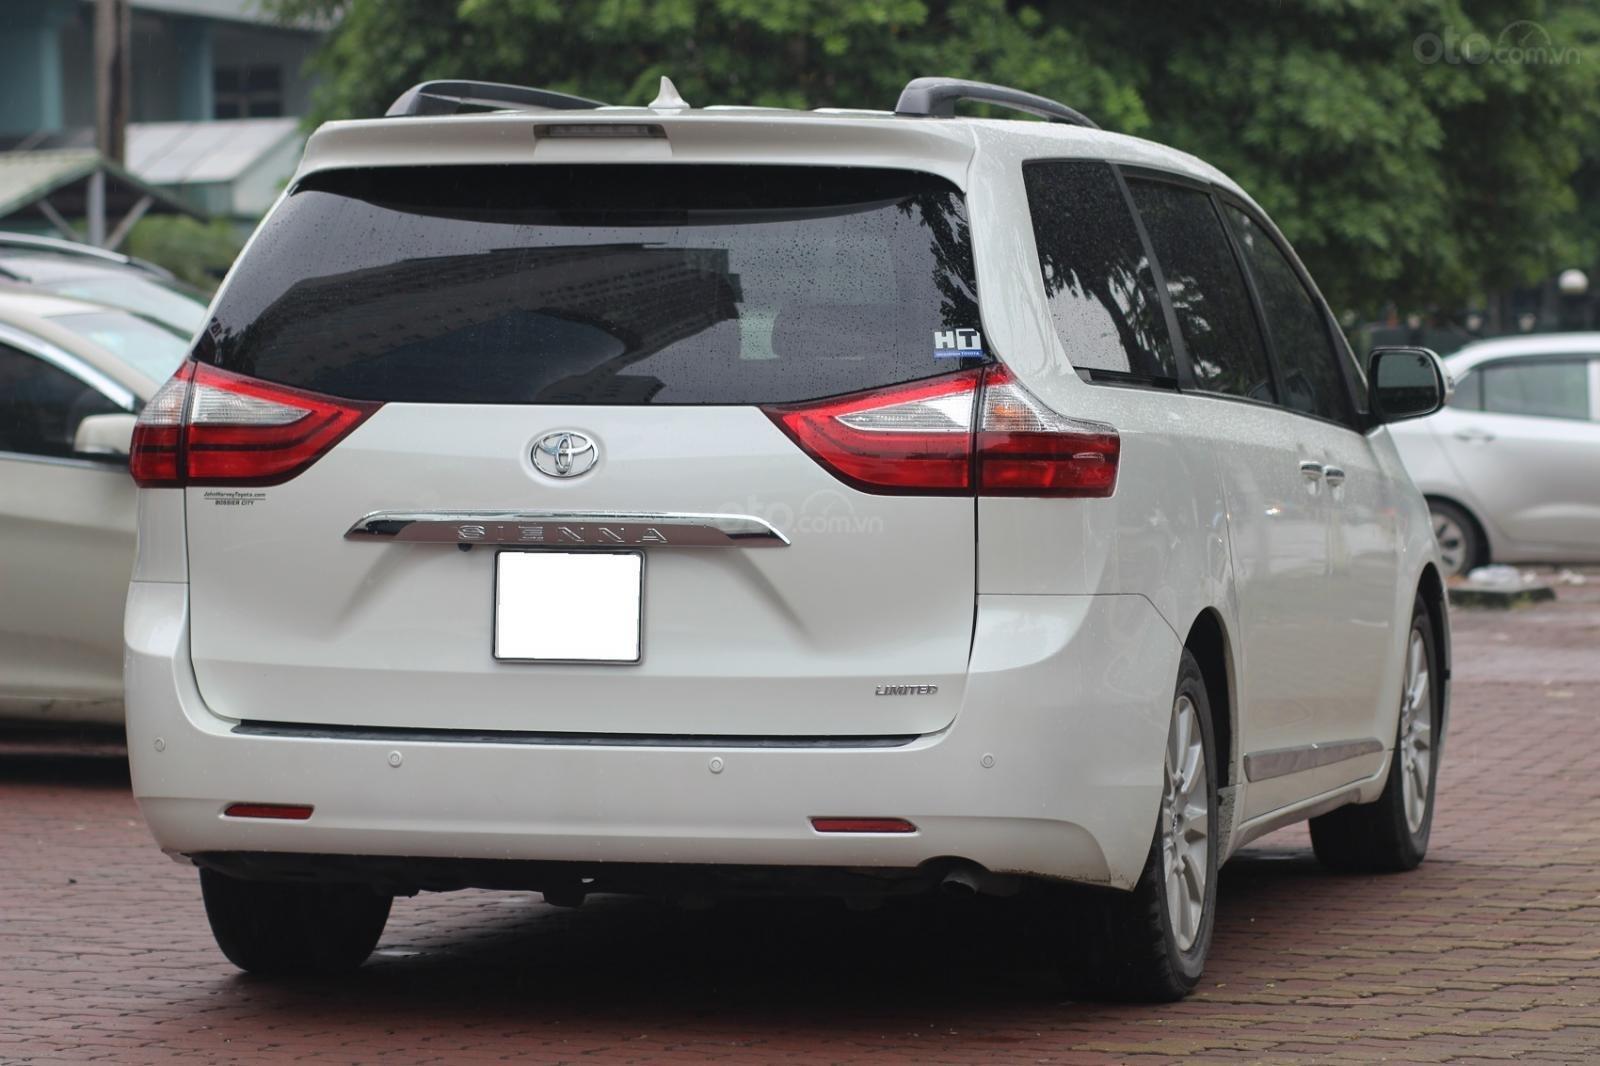 VOV Auto bán xe Toyota Sienna Limited 3.5 2013 (3)